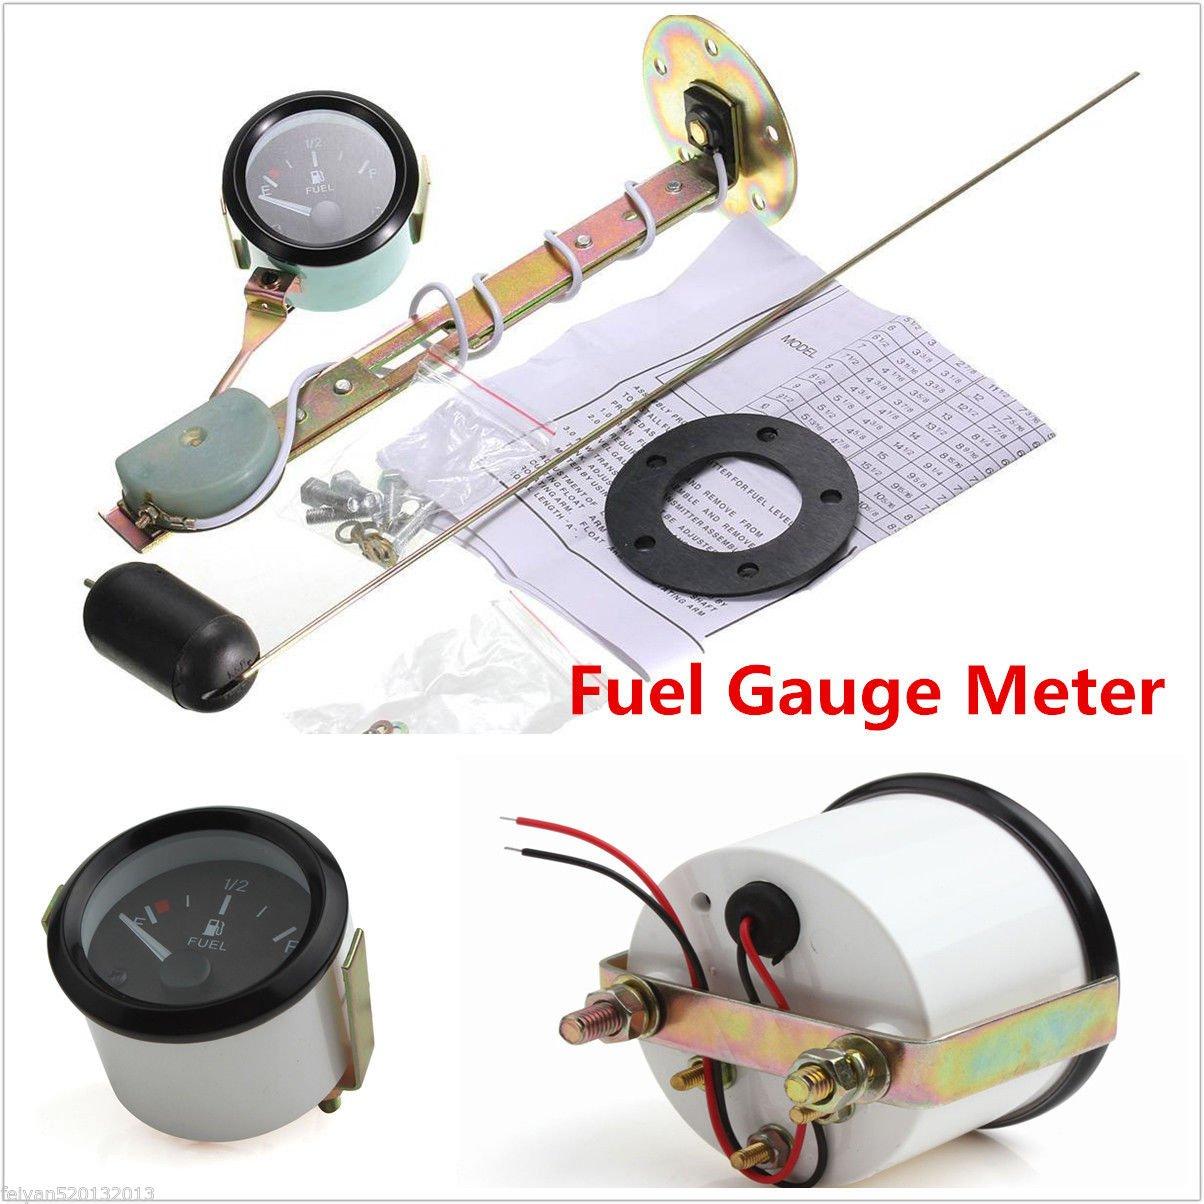 Medidor de nivel de combustible para coche, 52 mm, con sensor de combustible, puntero universal E-1/2-F BEEAUTO